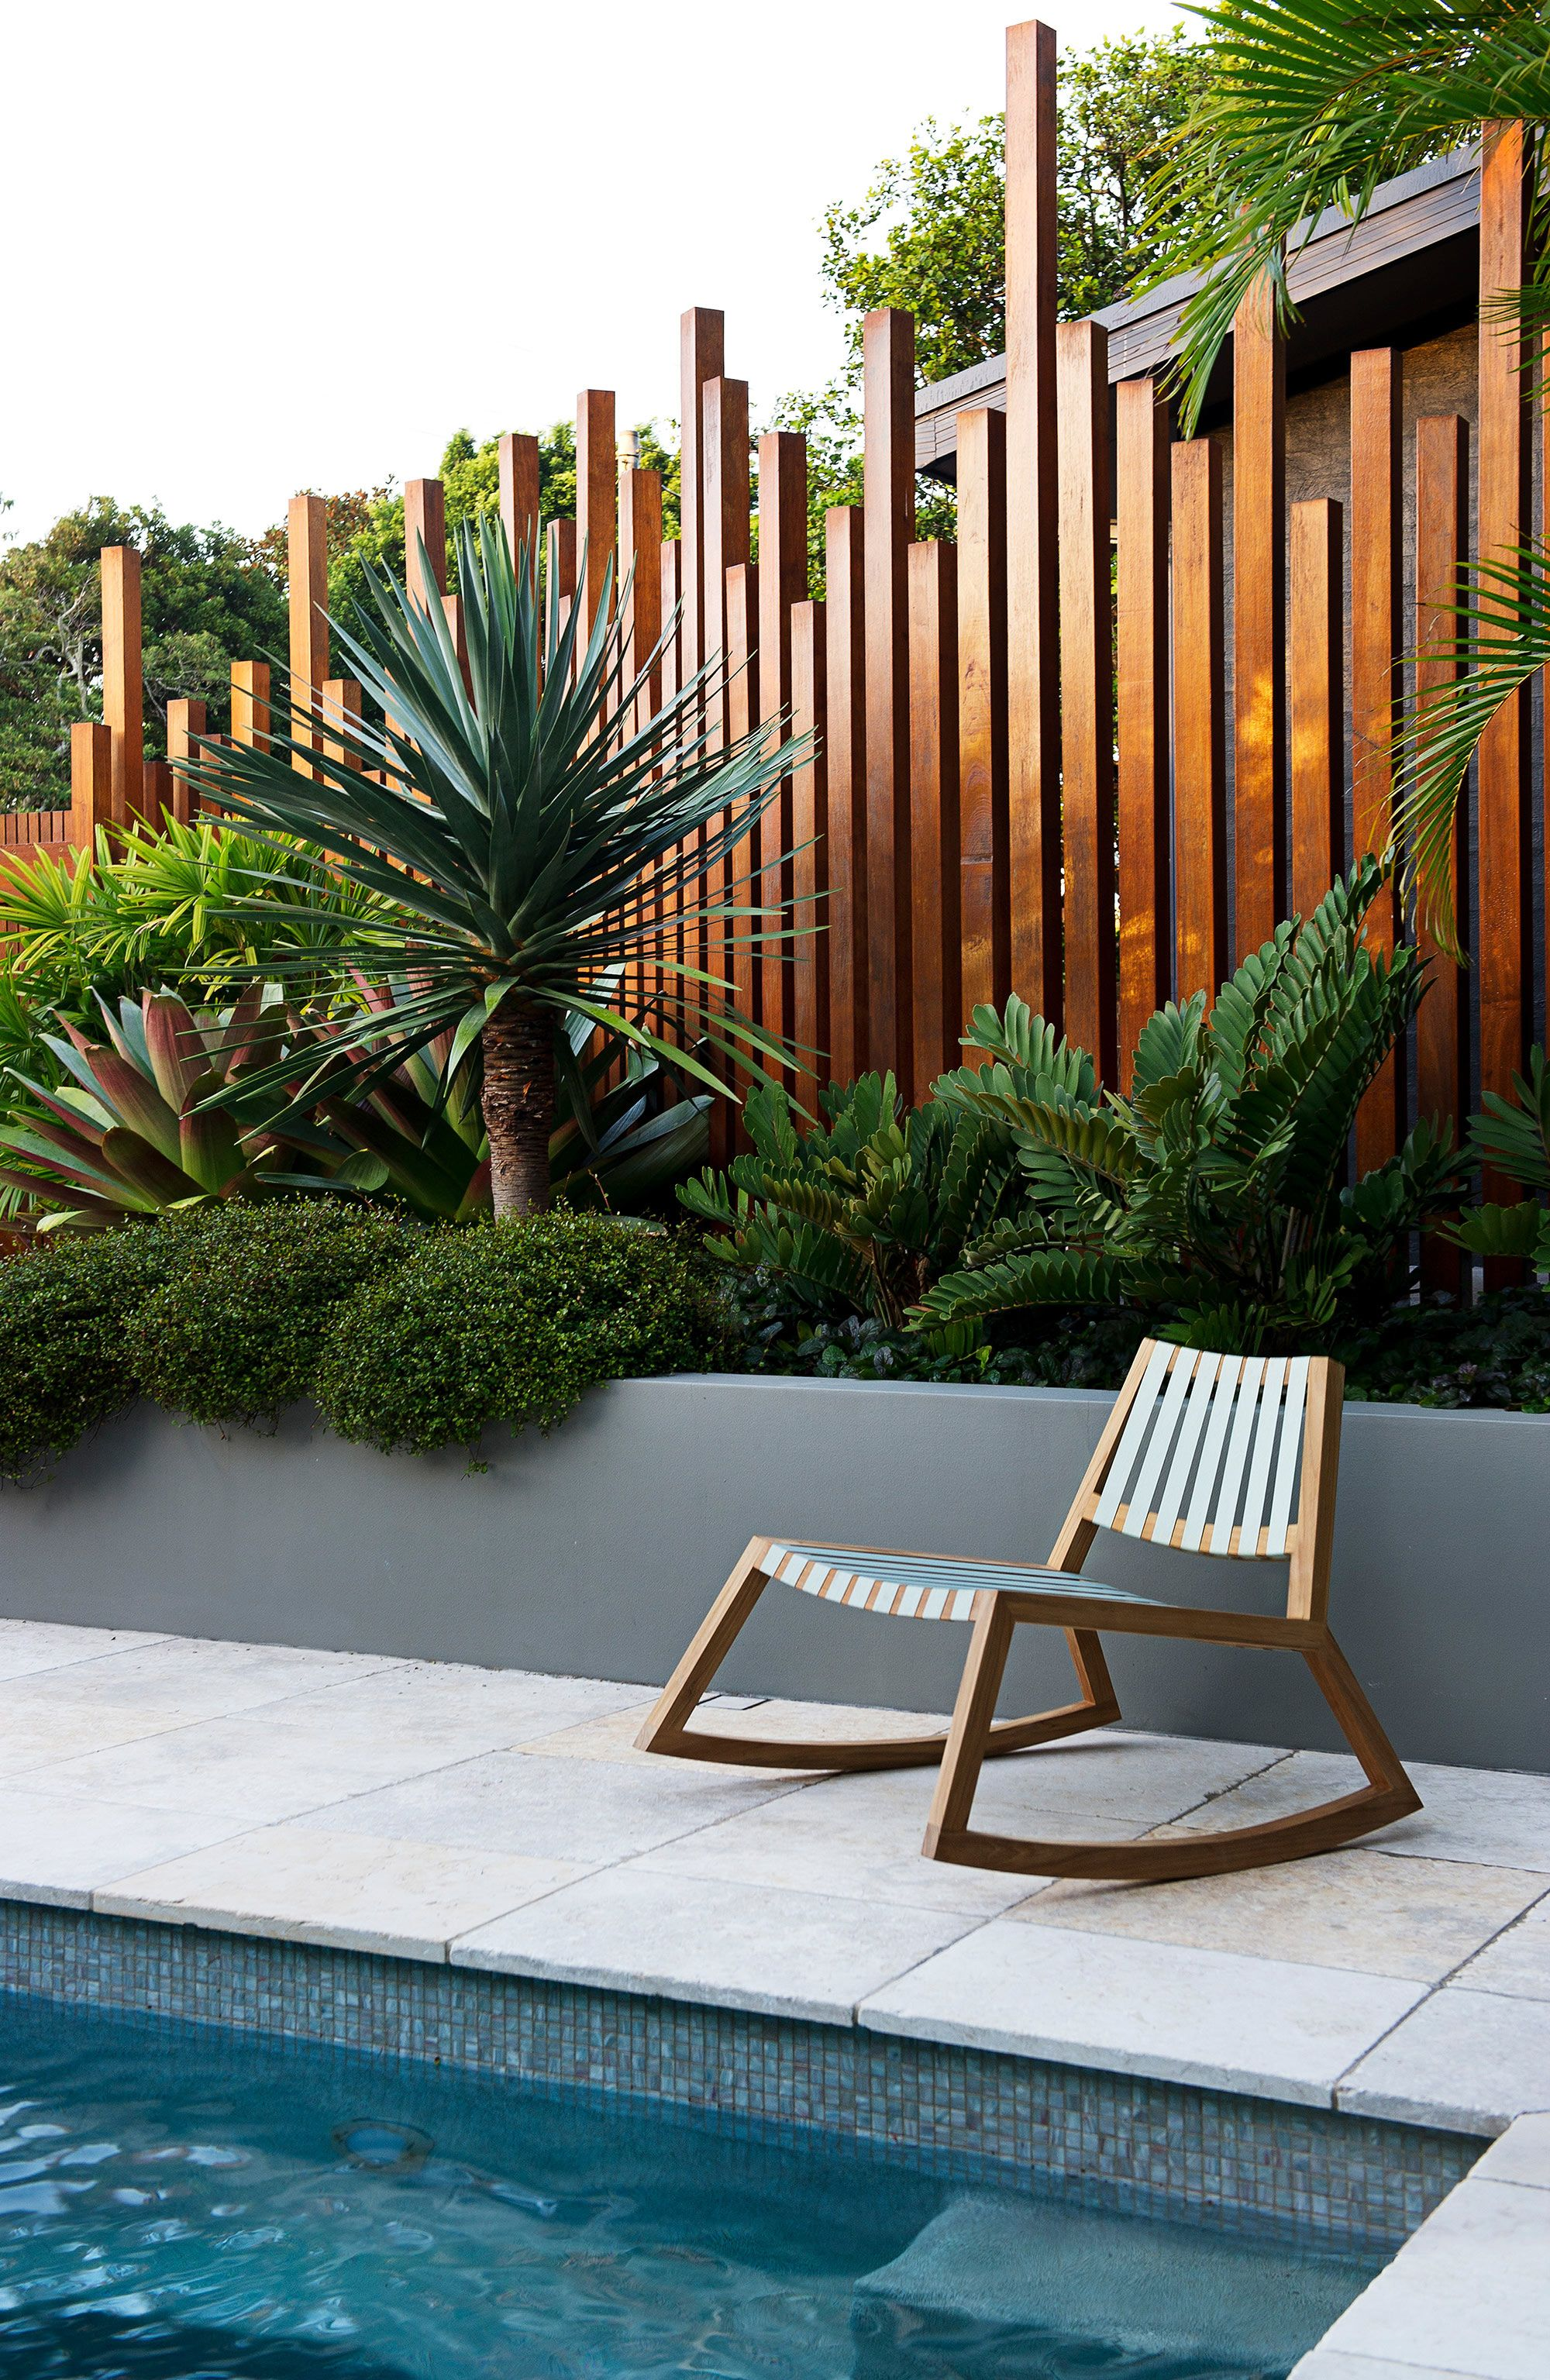 North Avoca Elgata Backyard Landscaping Designs Backyard Landscaping Backyard Design Modern backyard pool landscaping